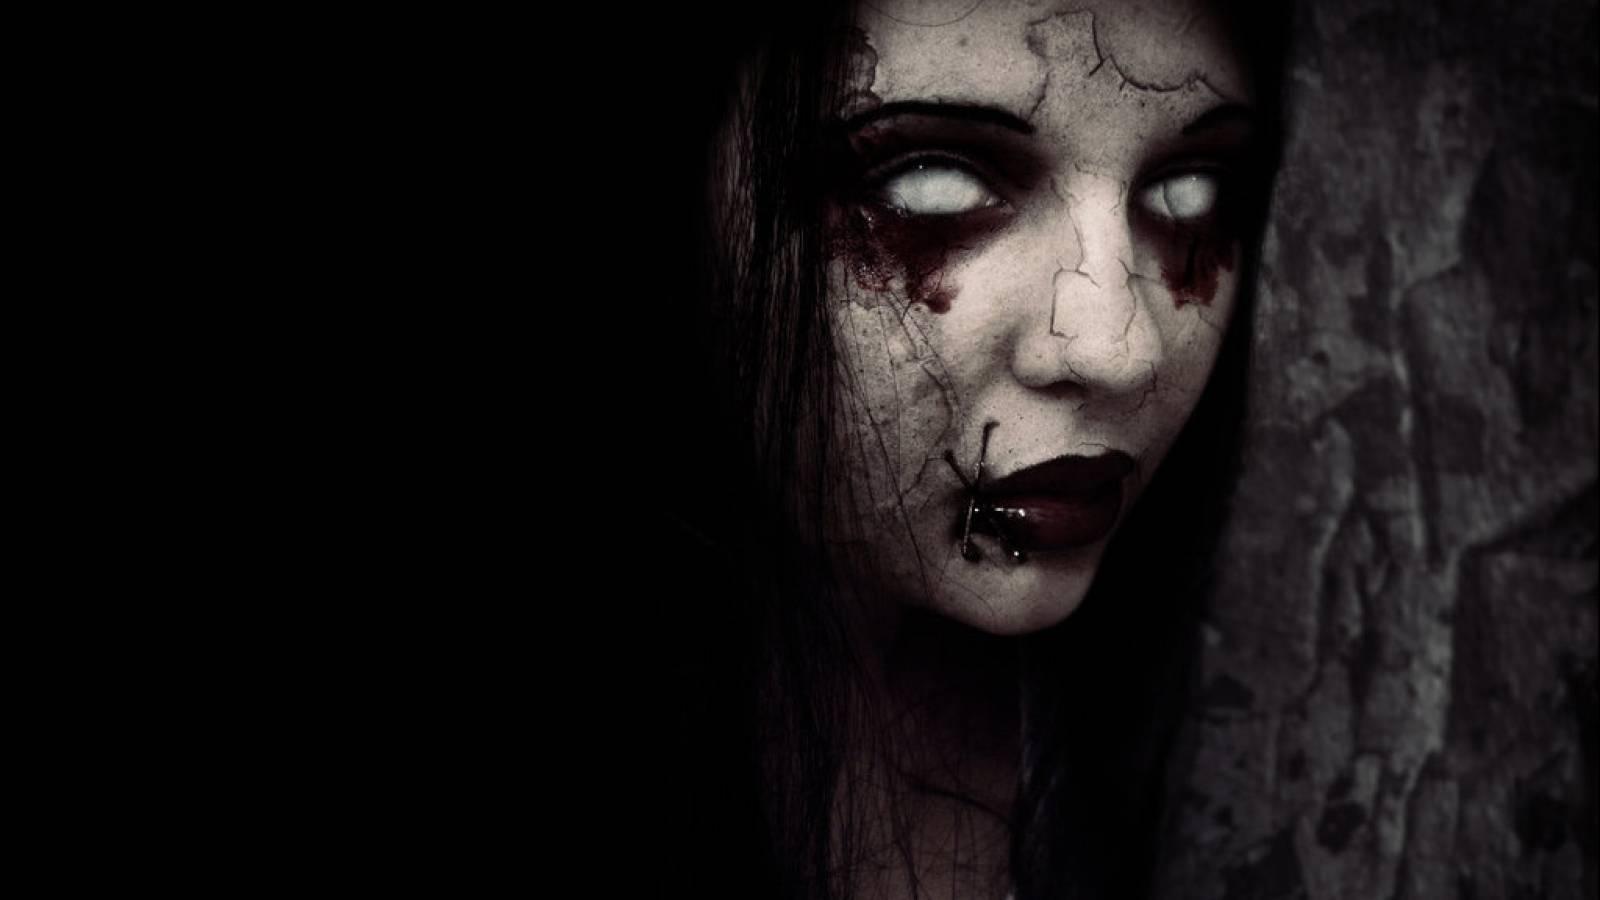 Creepy Wallpaper Wallpaper of an creepy girl 1600x900